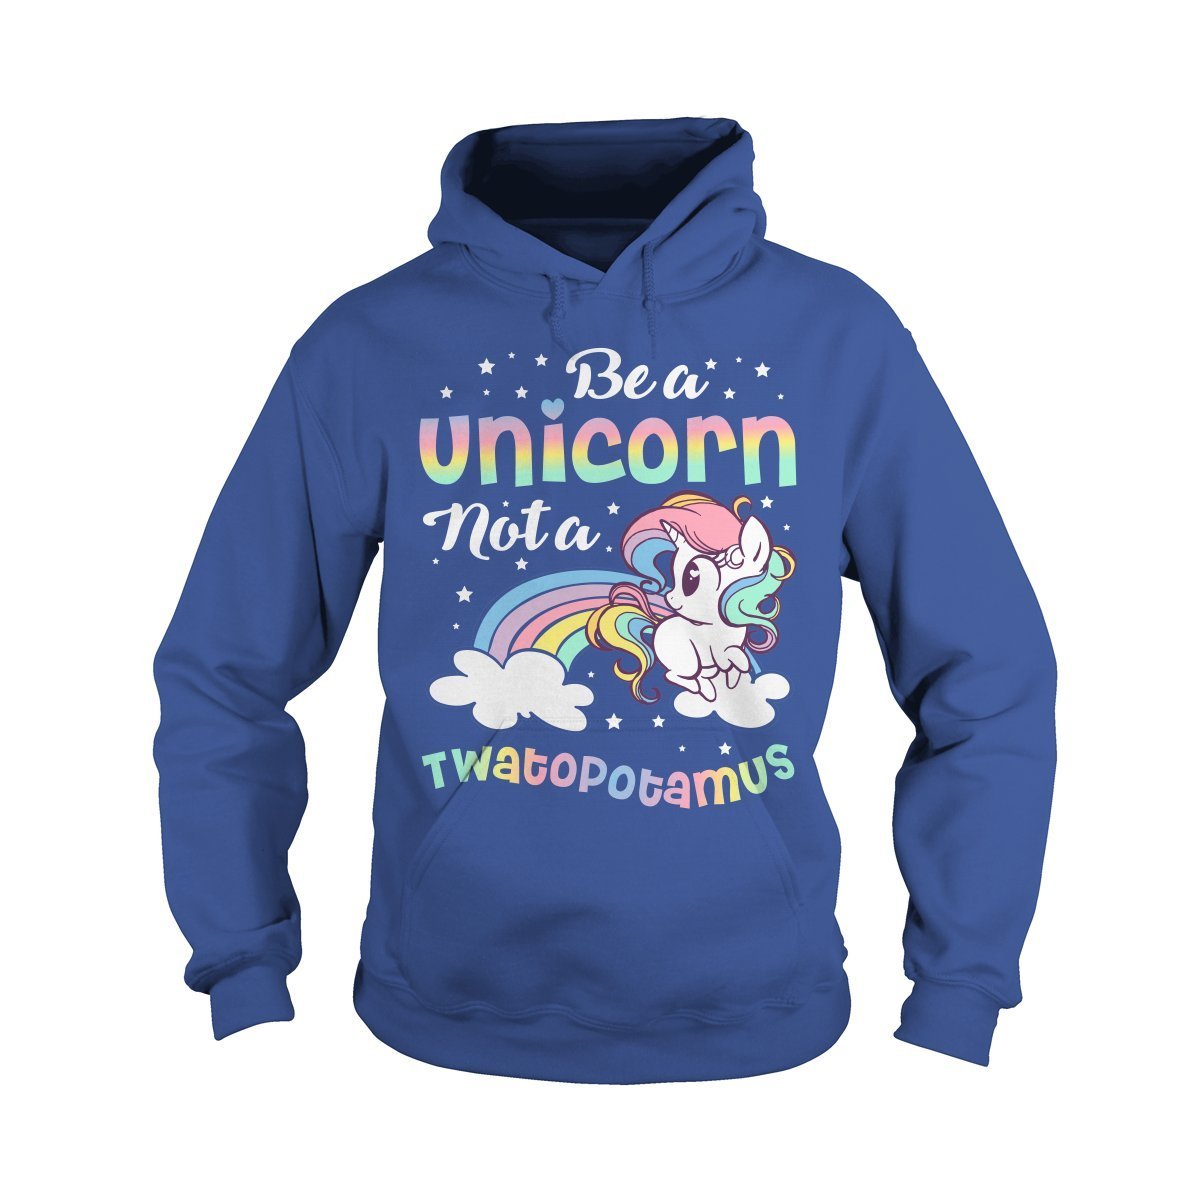 Hoodie Royal blueee 3XLarge Be a Unicorn not a Twatopotamus TShirt